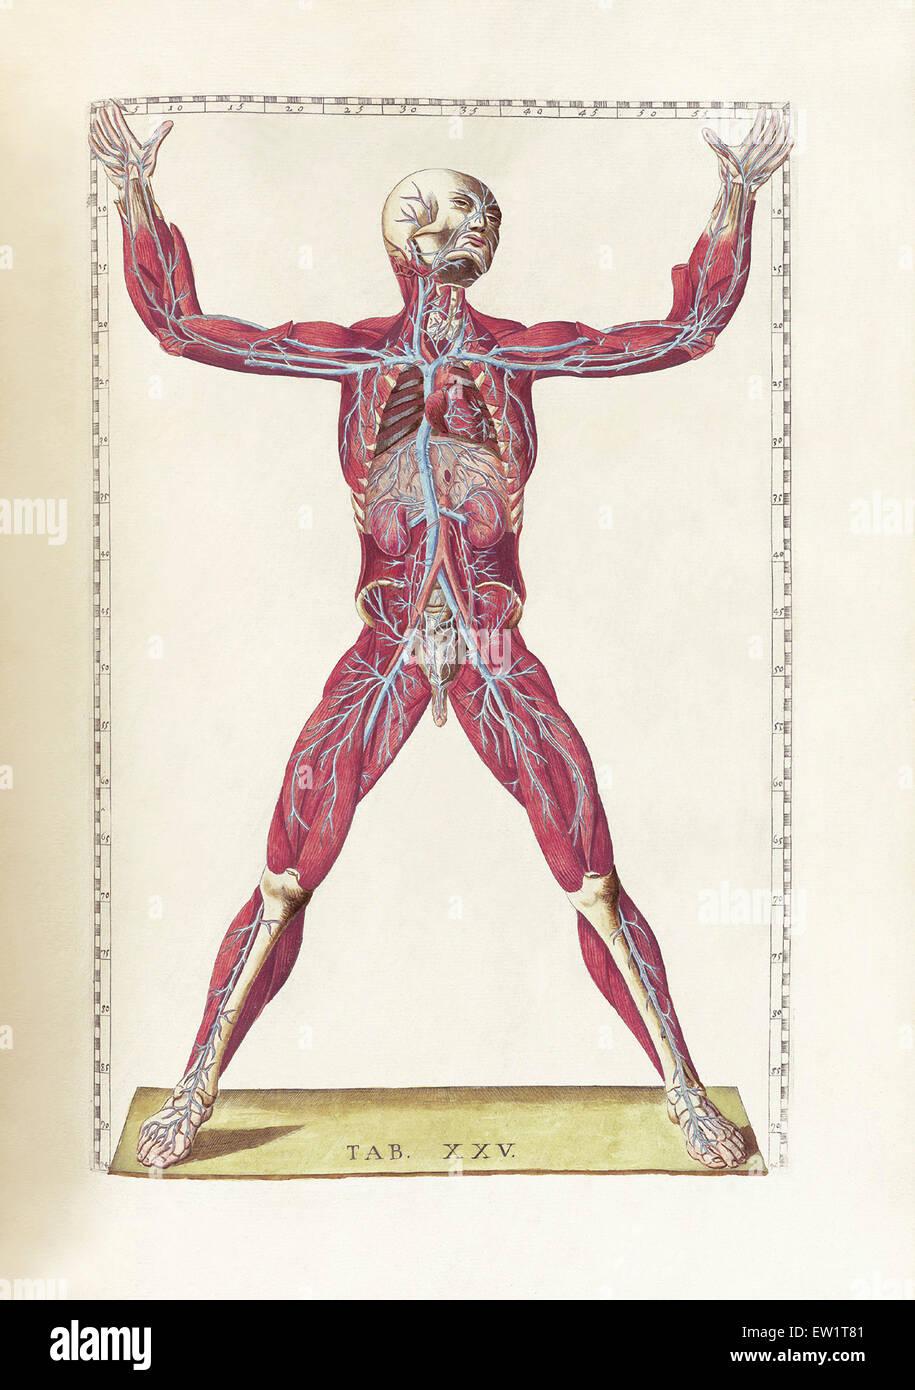 The science of human anatomy by Bartholomeo Eustachi, depicting the ...